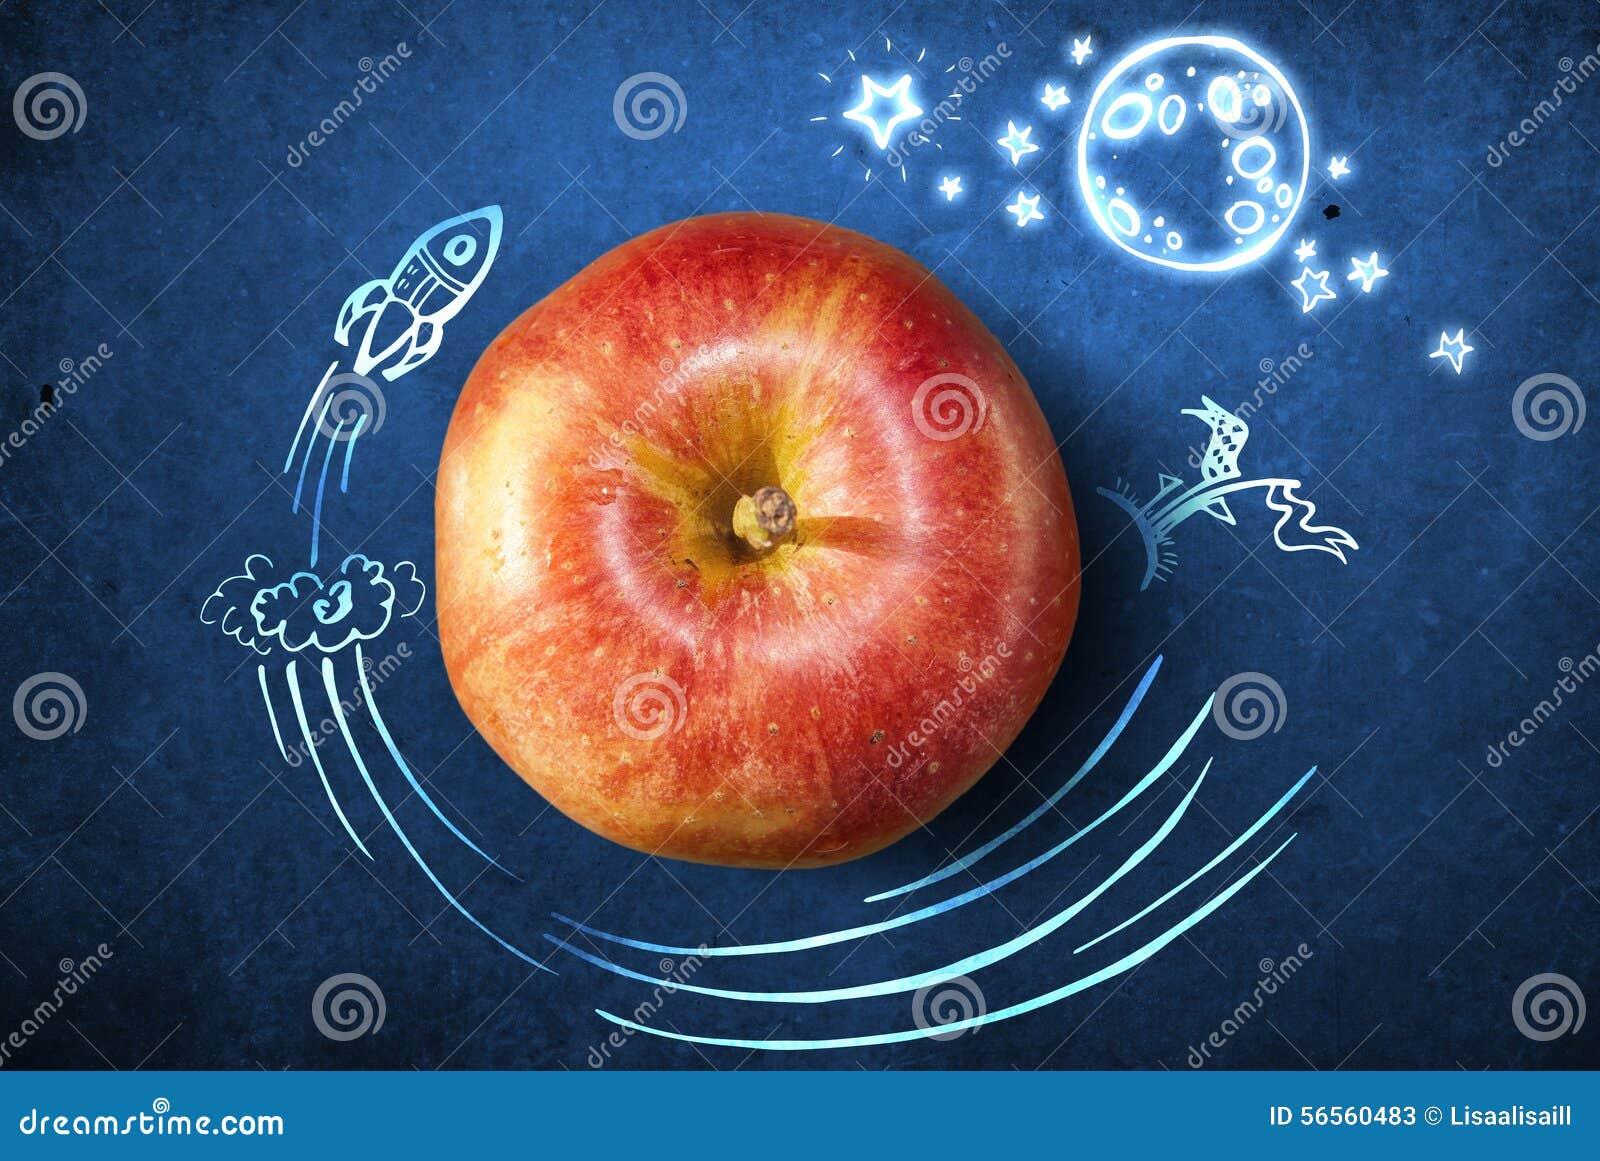 Download Έννοια με το μήλο και Doodles Απεικόνιση αποθεμάτων - εικονογραφία από κύκλος, εξωτερικός: 56560483